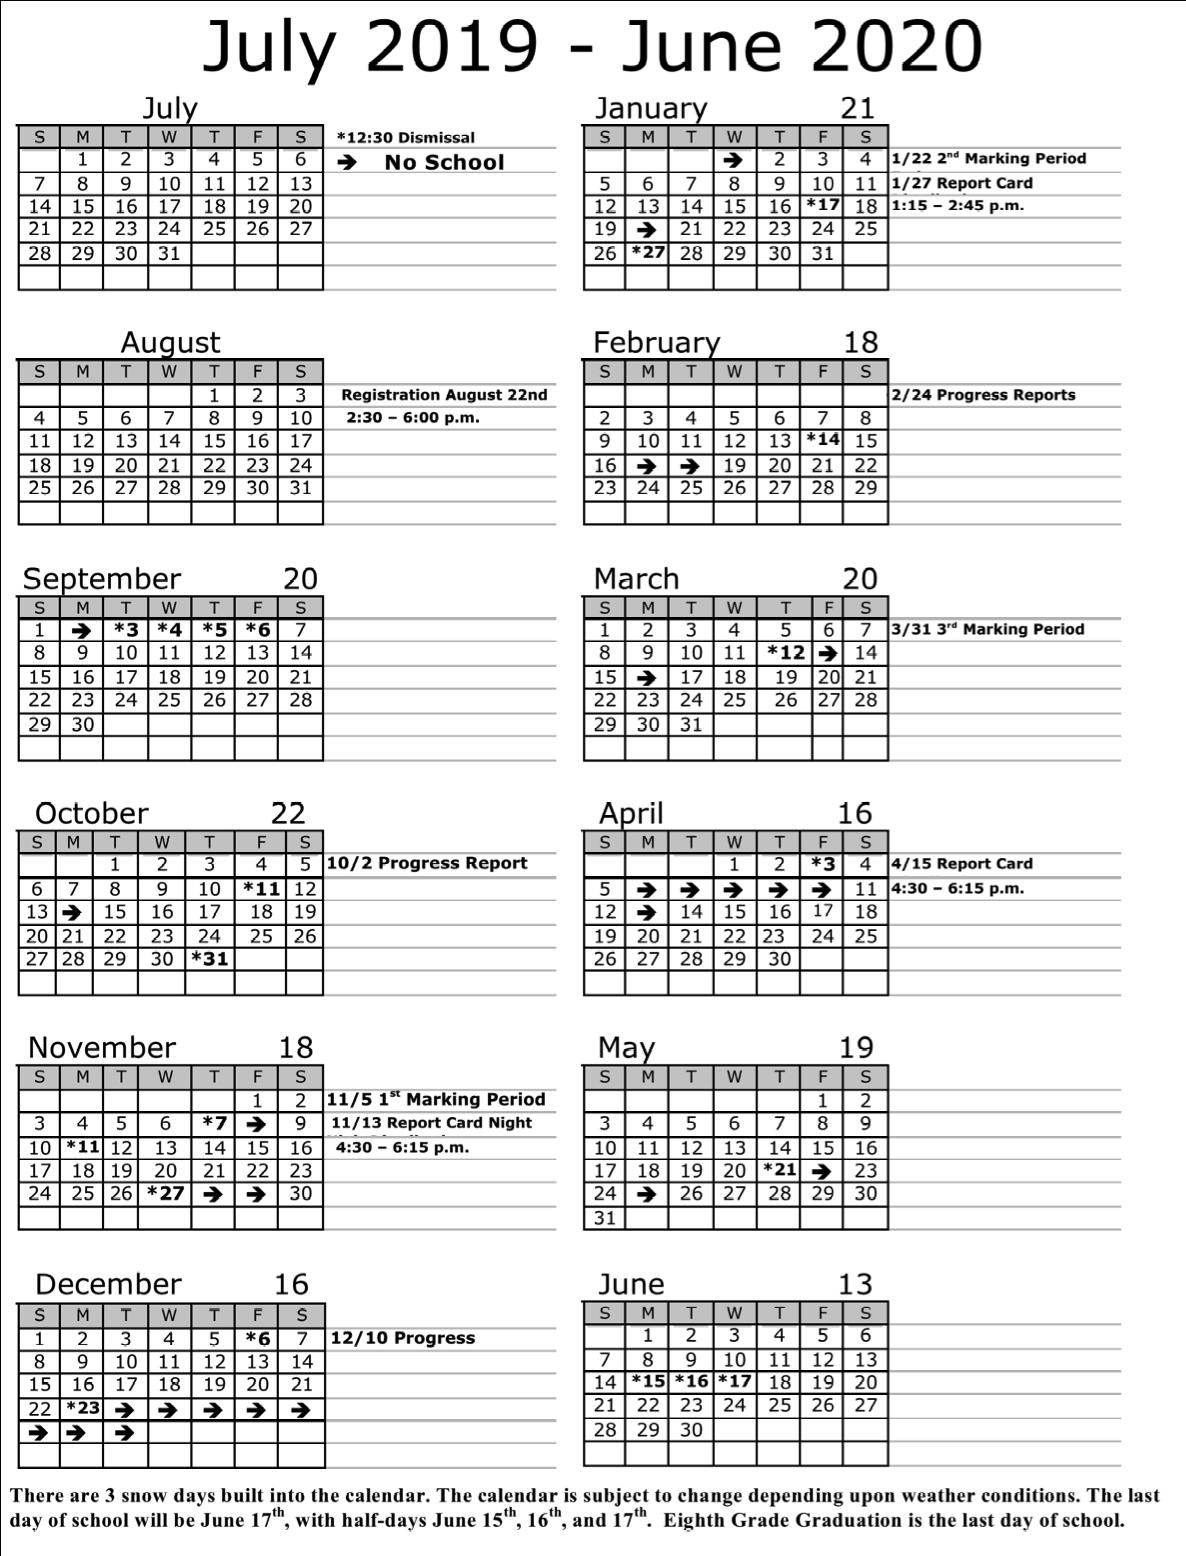 Annual Calendar | Soaring Heights Charter School In Jersey City Board Of Education Member Calendar